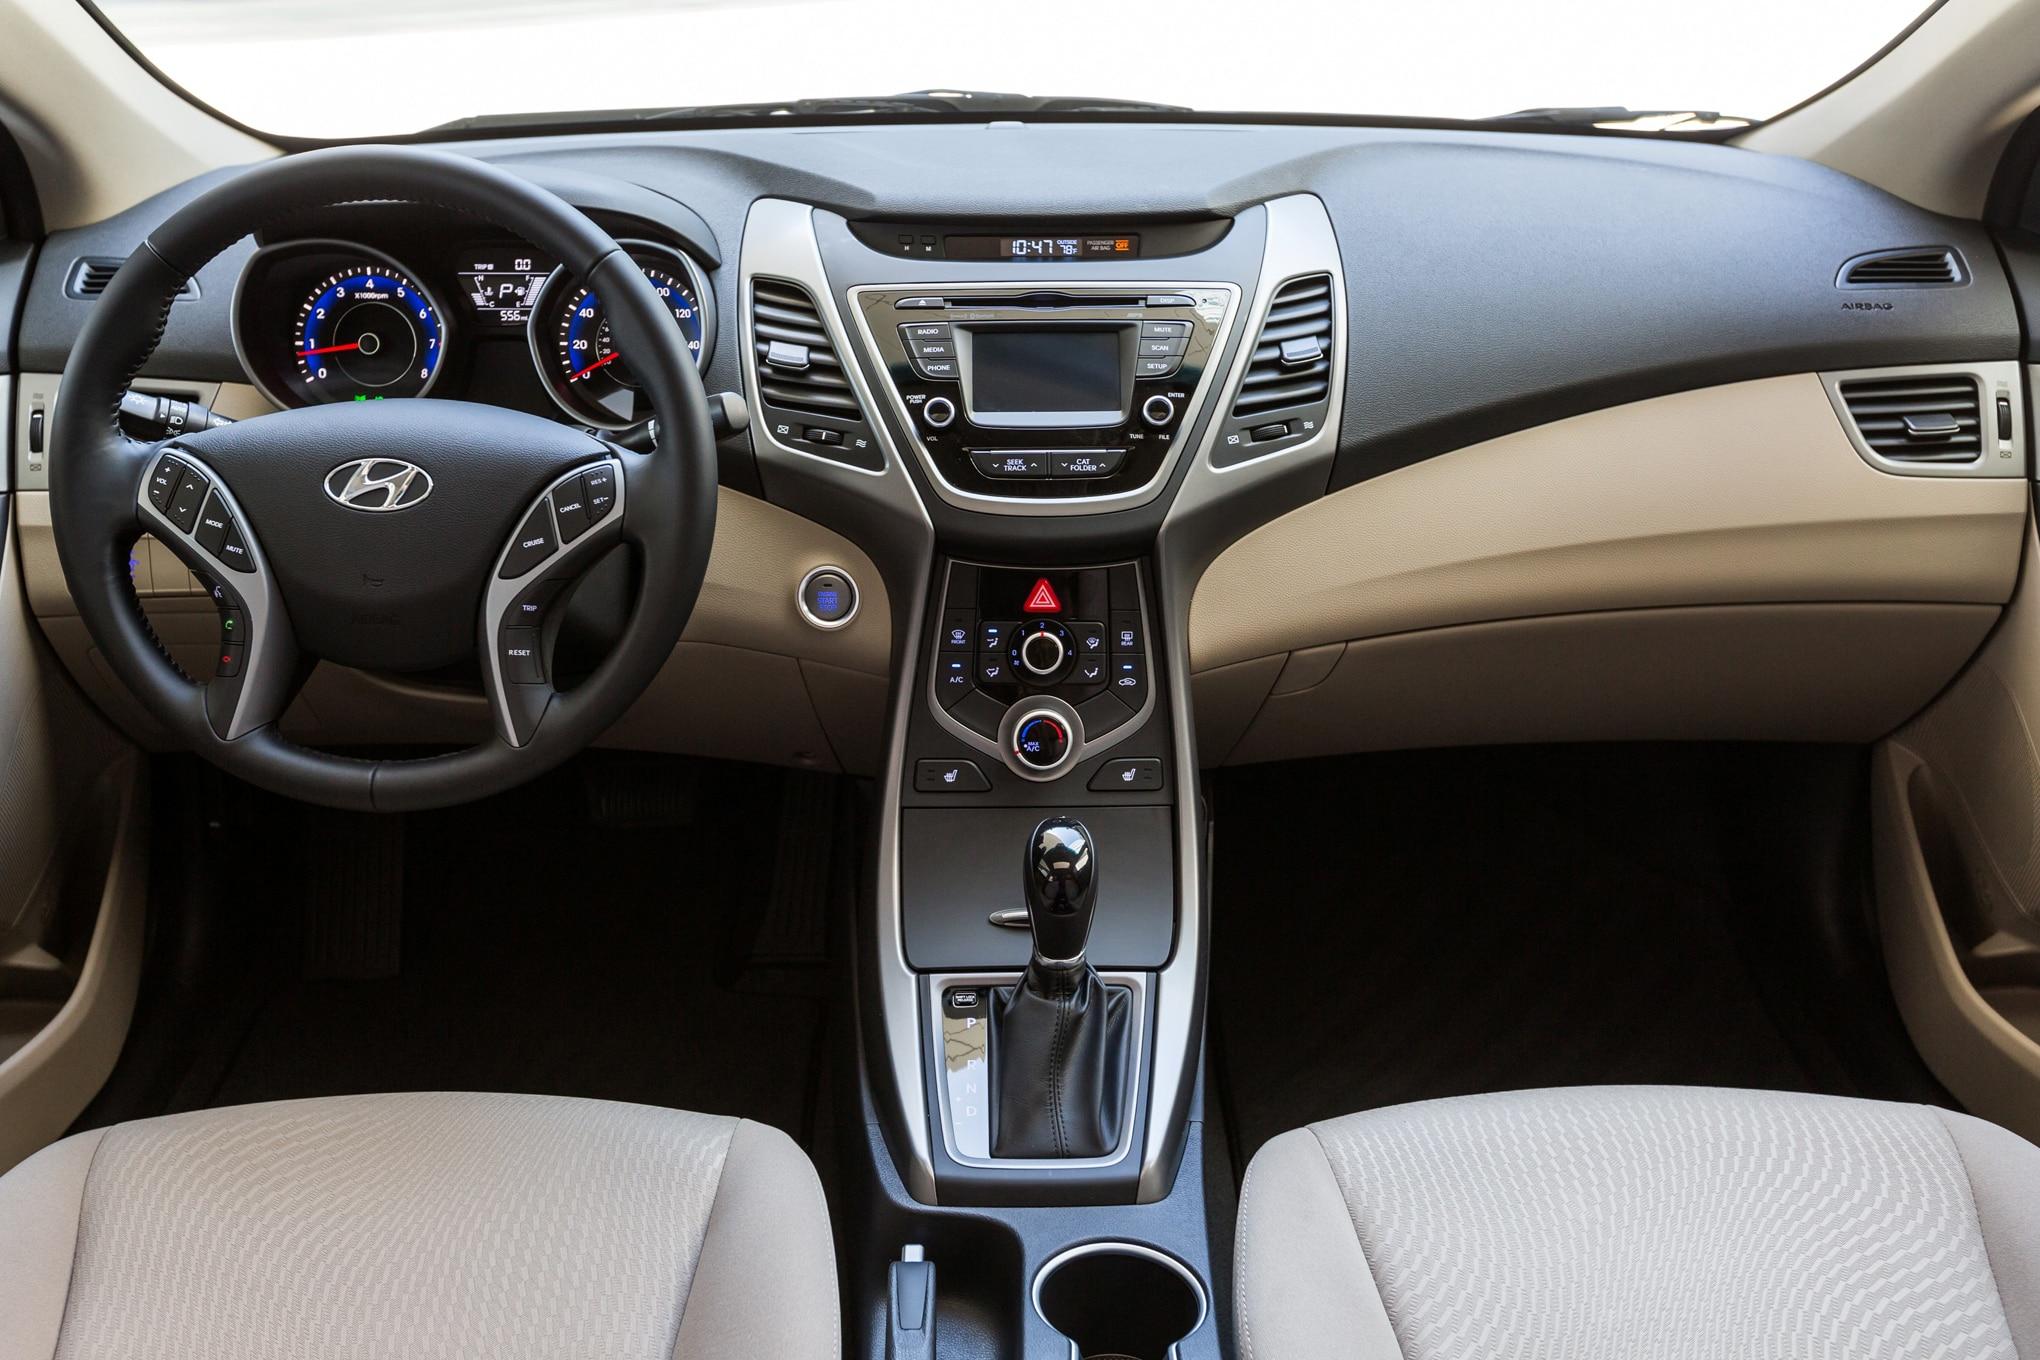 2016 Hyundai Elantra. 22 162